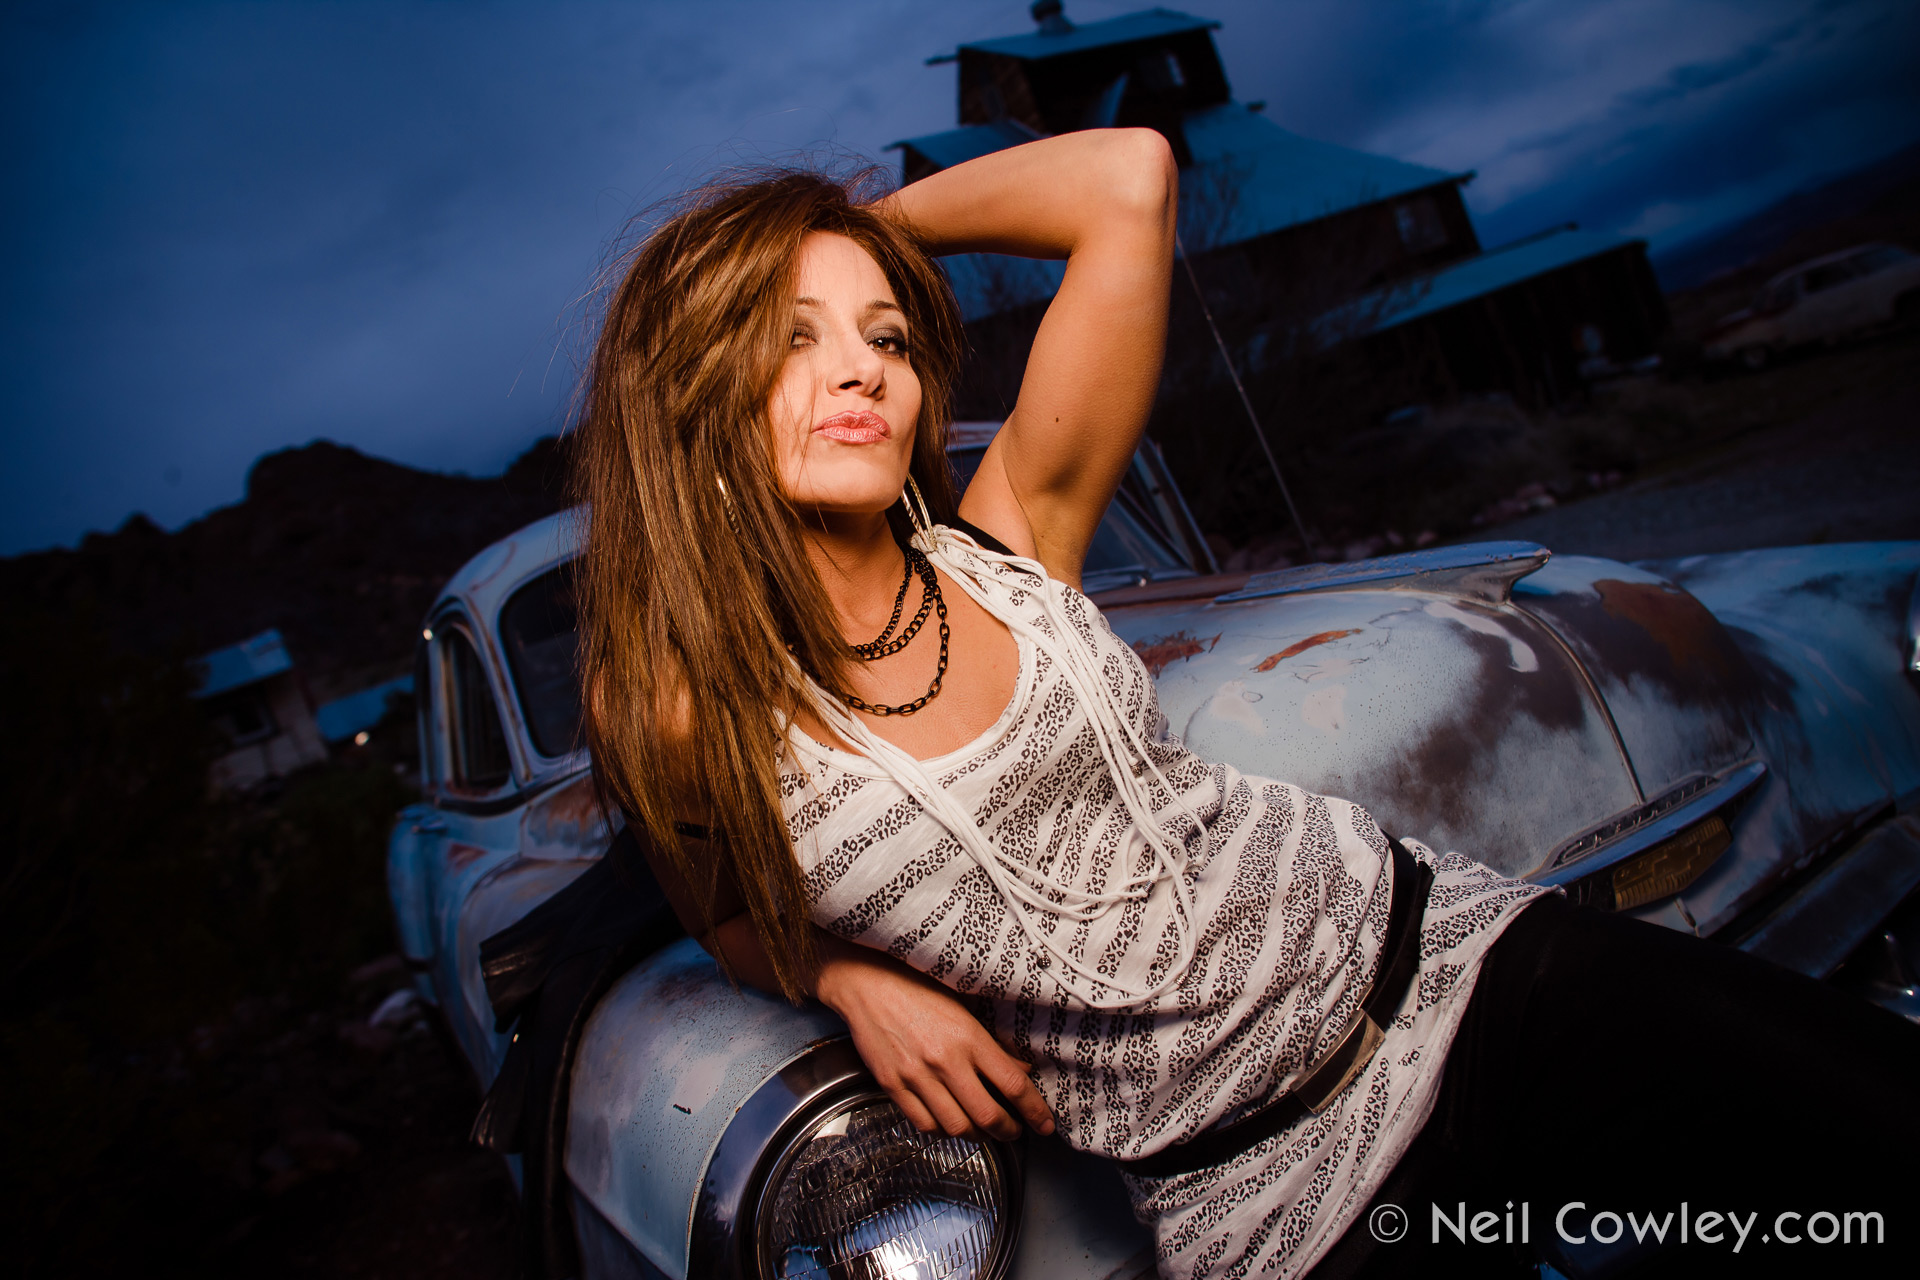 peoria-commercial-photographer-0099